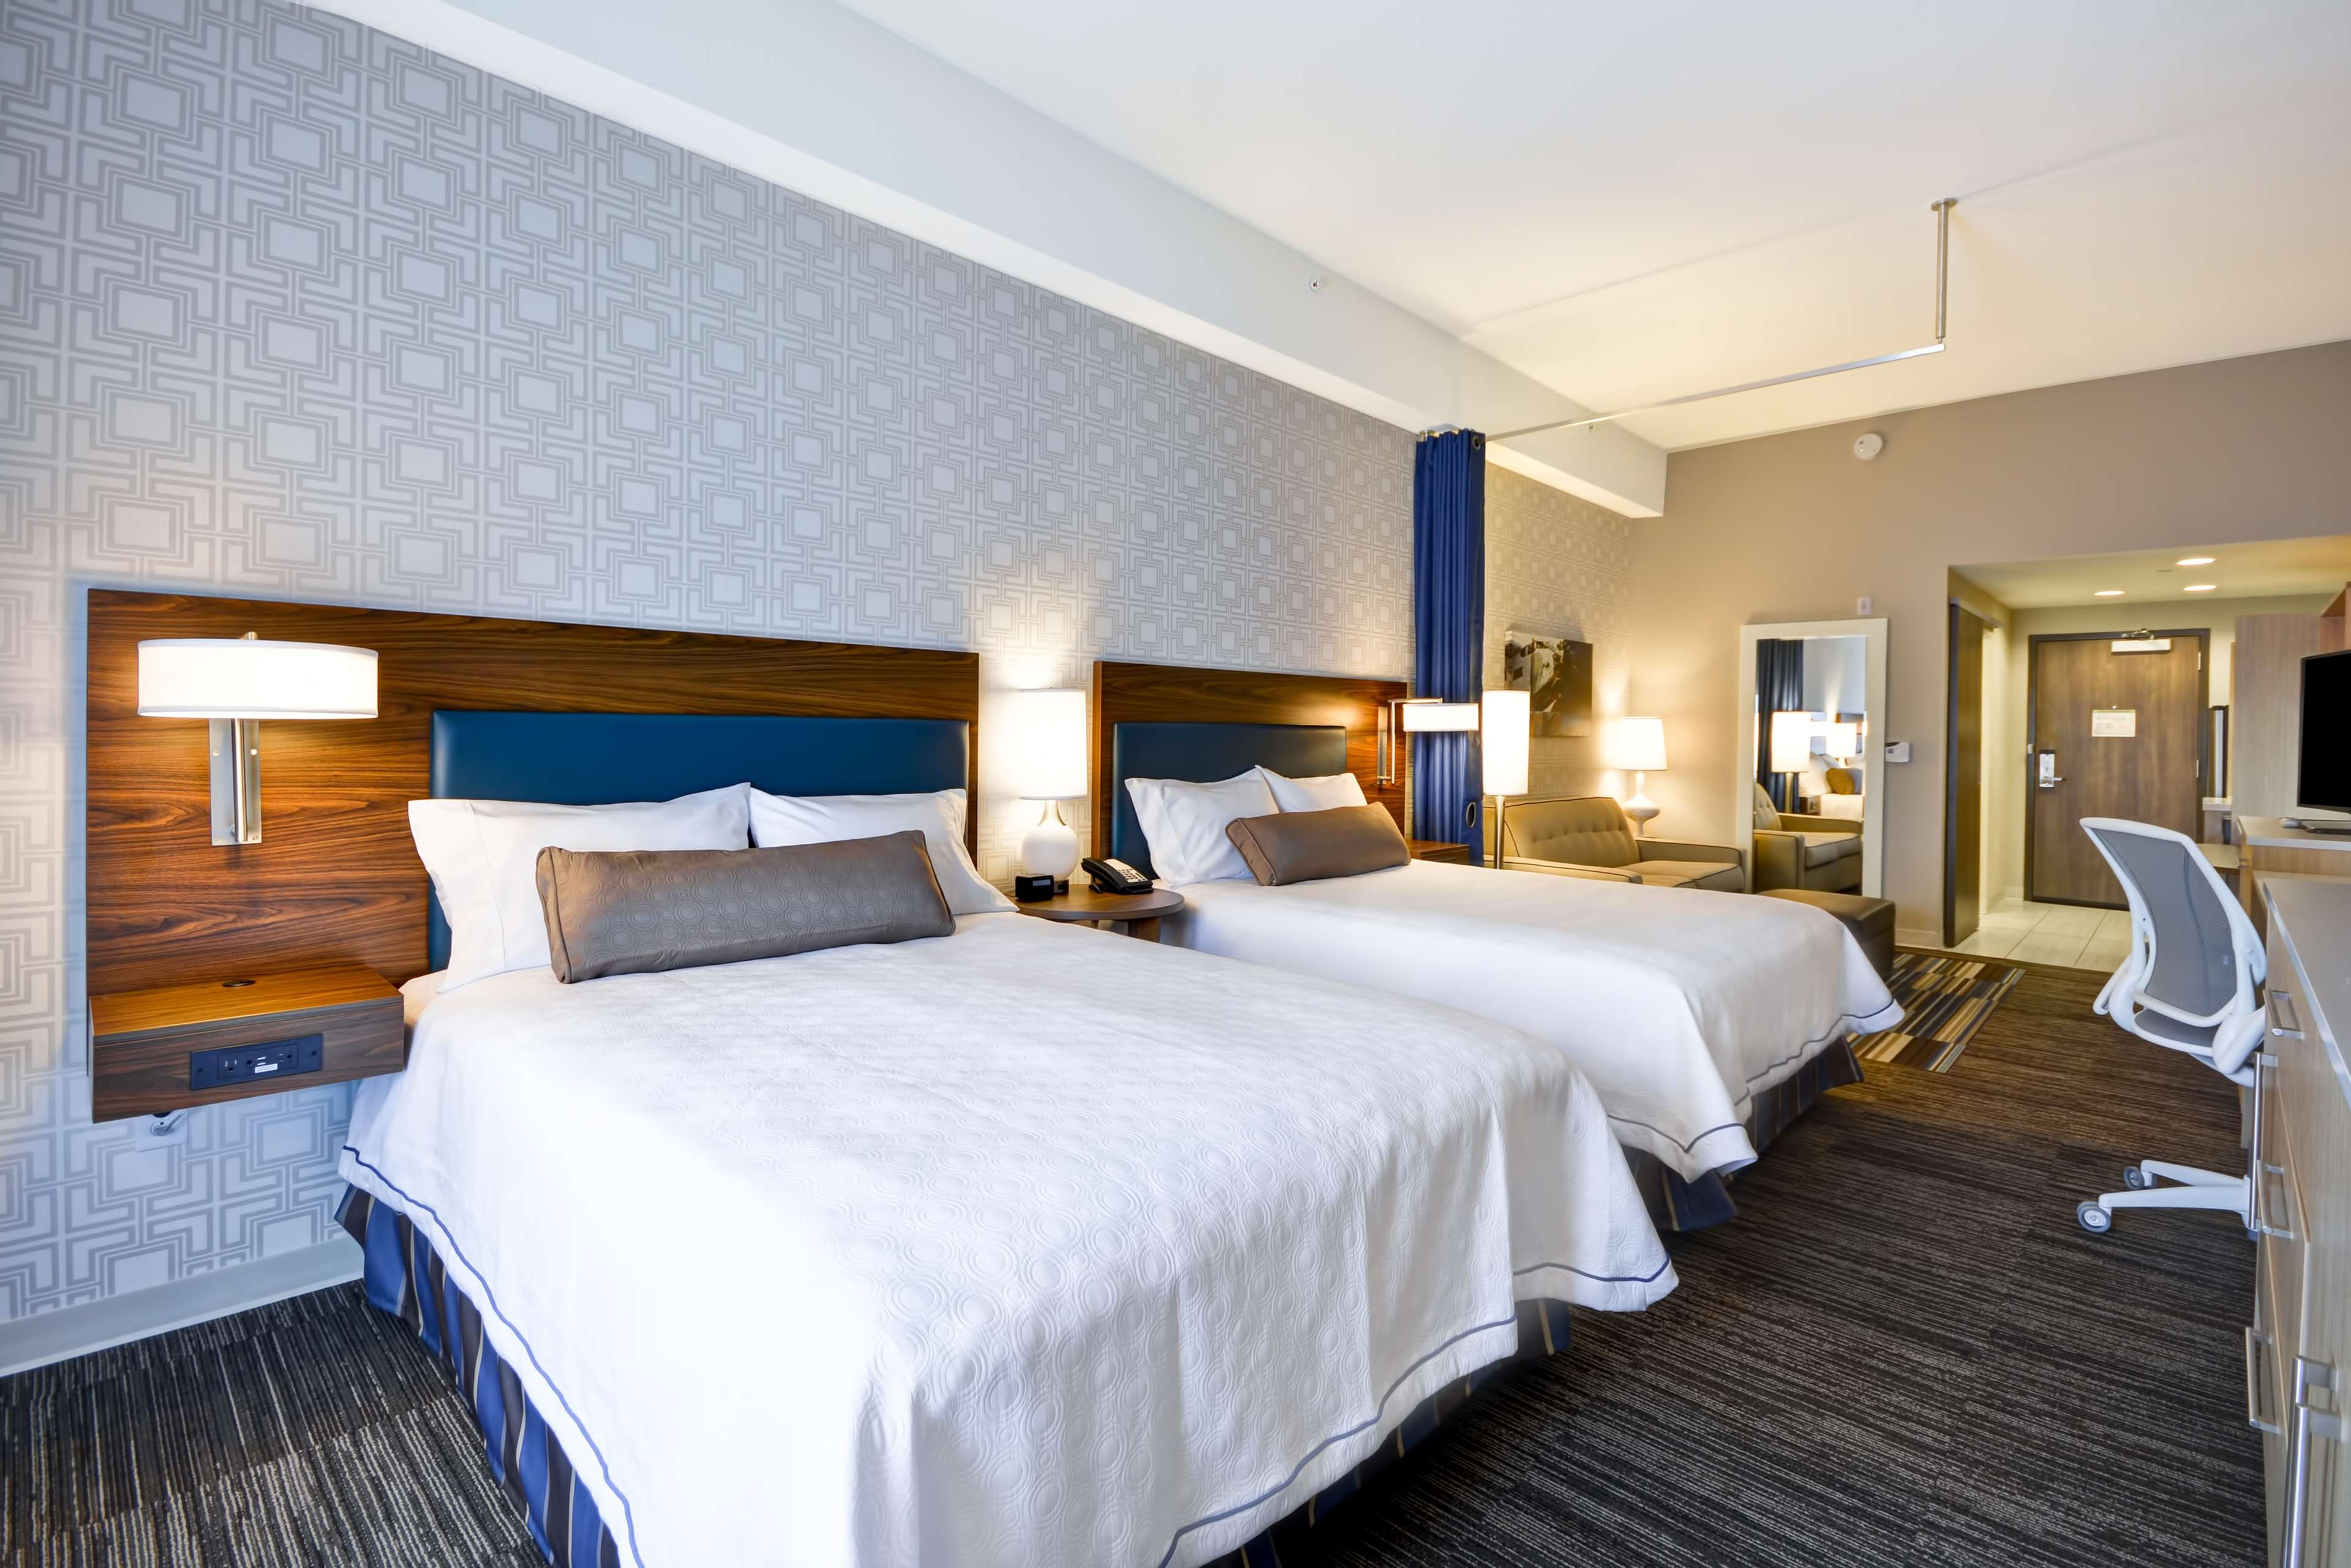 Home2 Suites by Hilton  St. Simons Island image 43